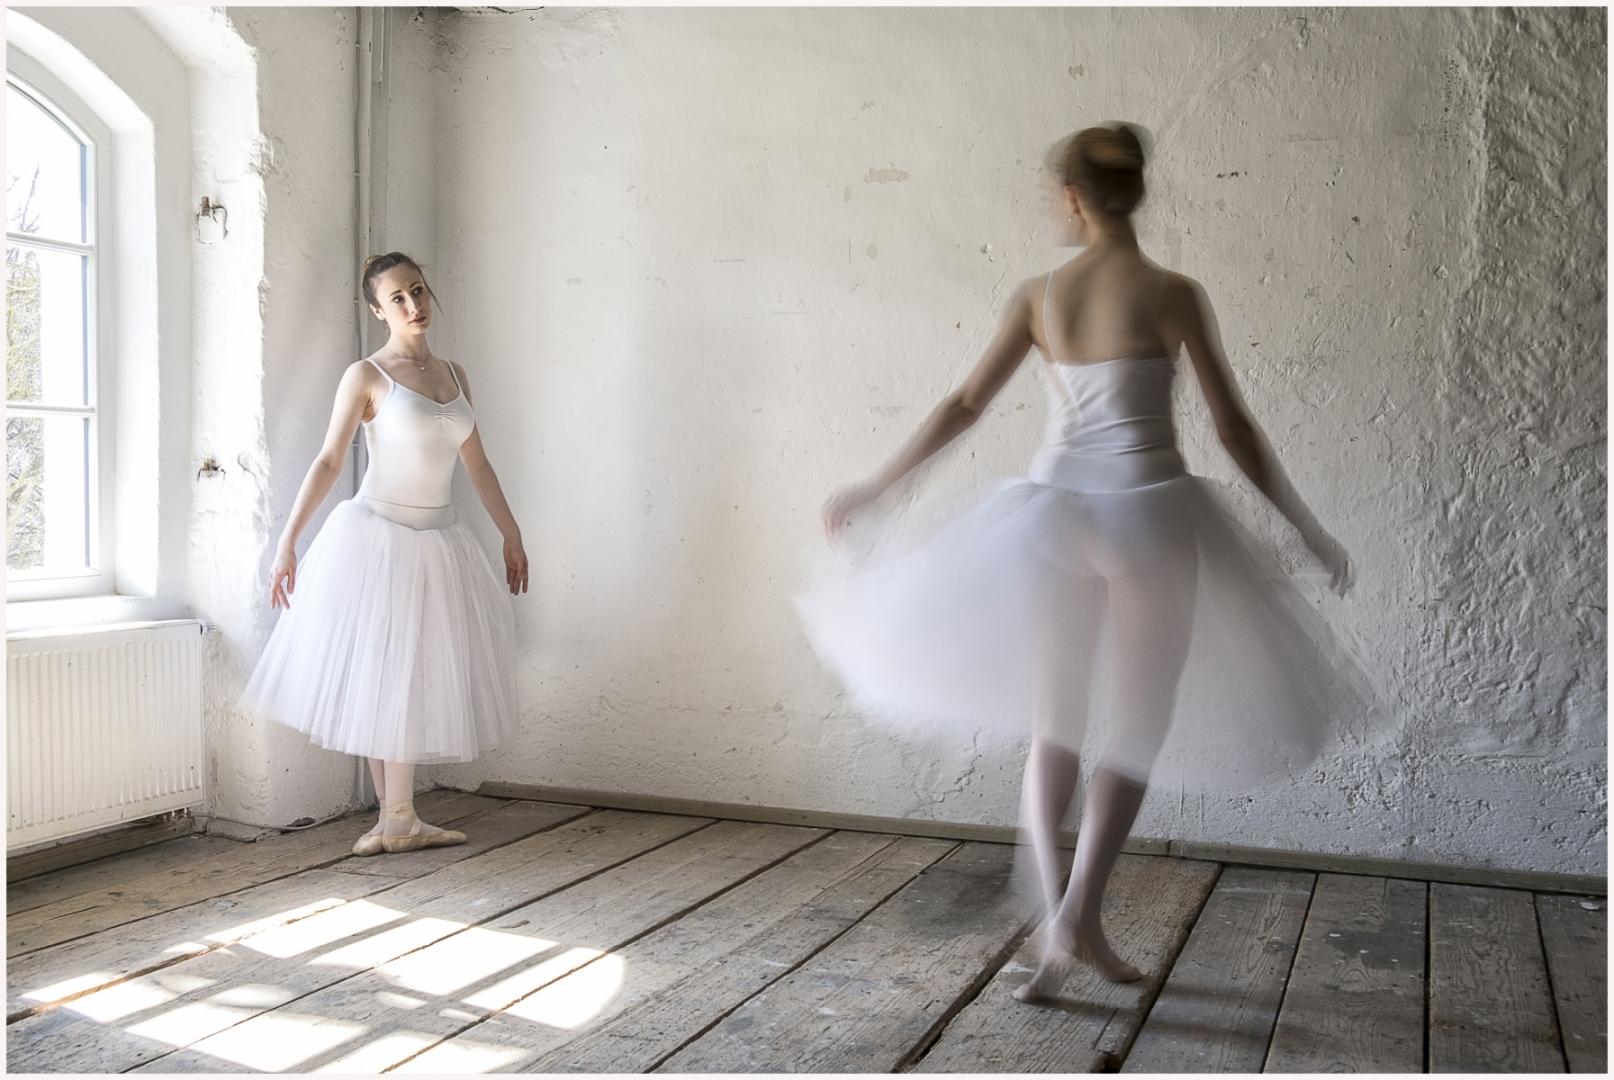 042-Ballett-250317